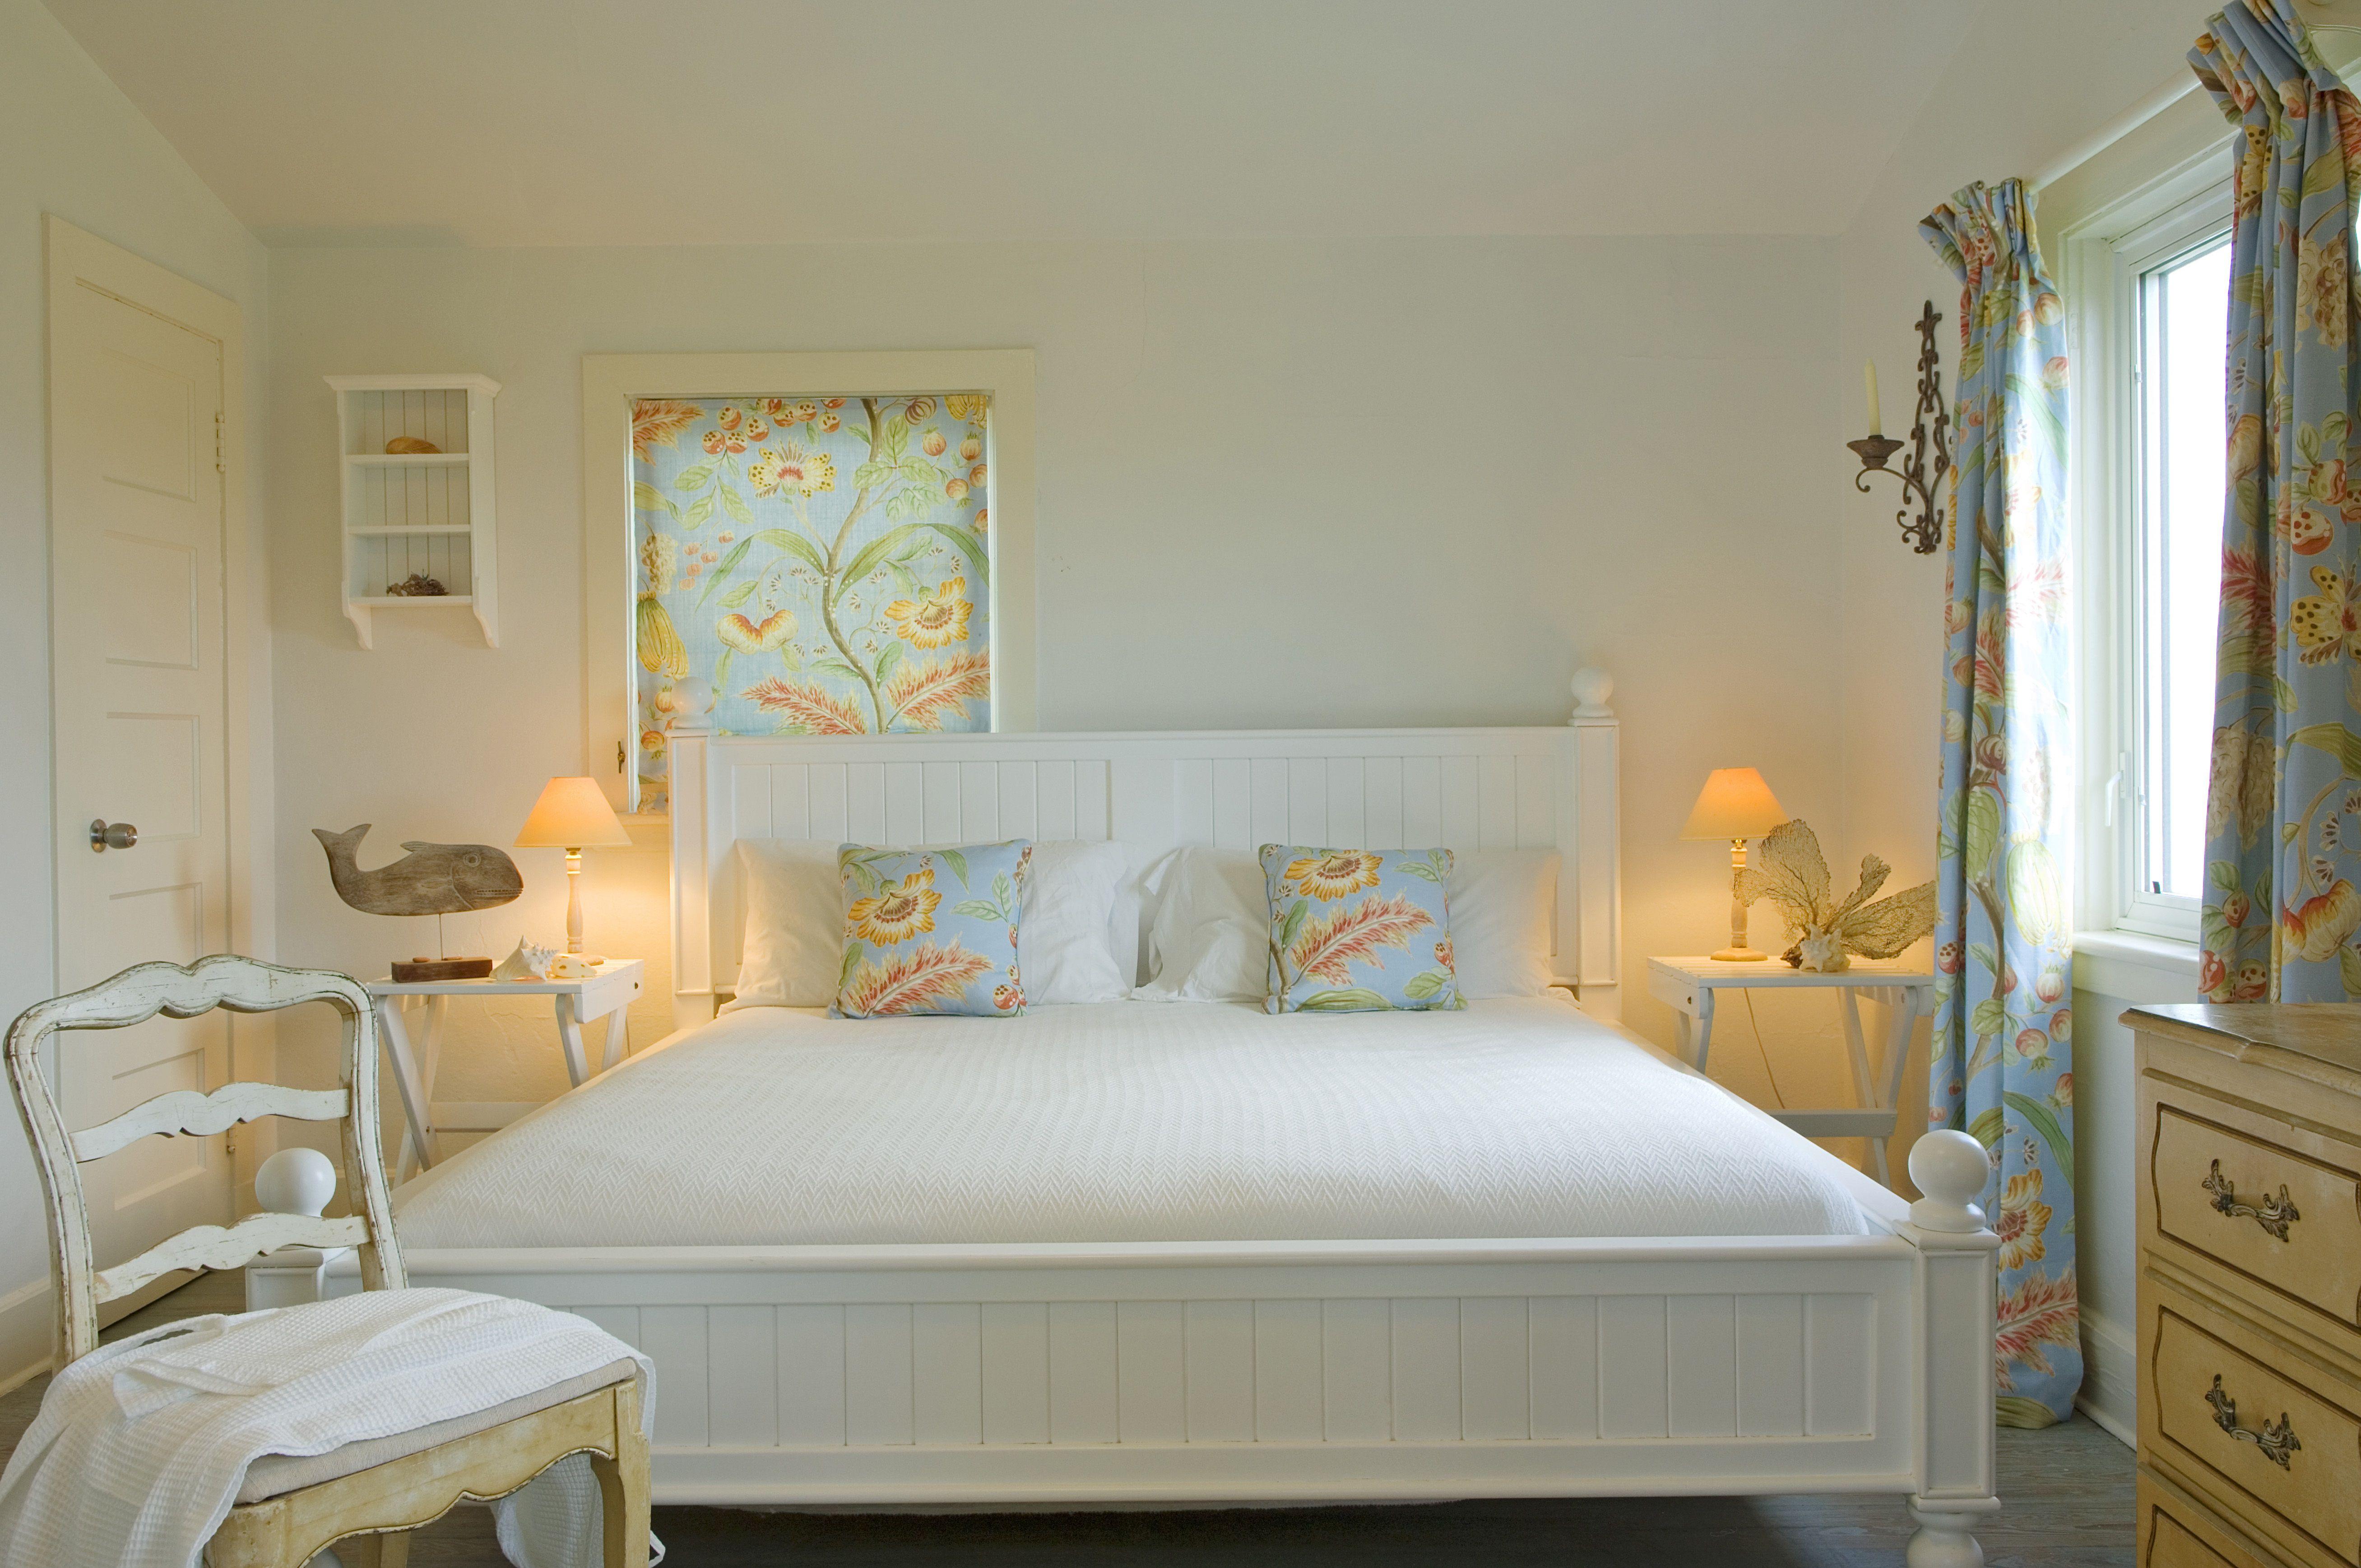 Ideas de dormitorio tropical